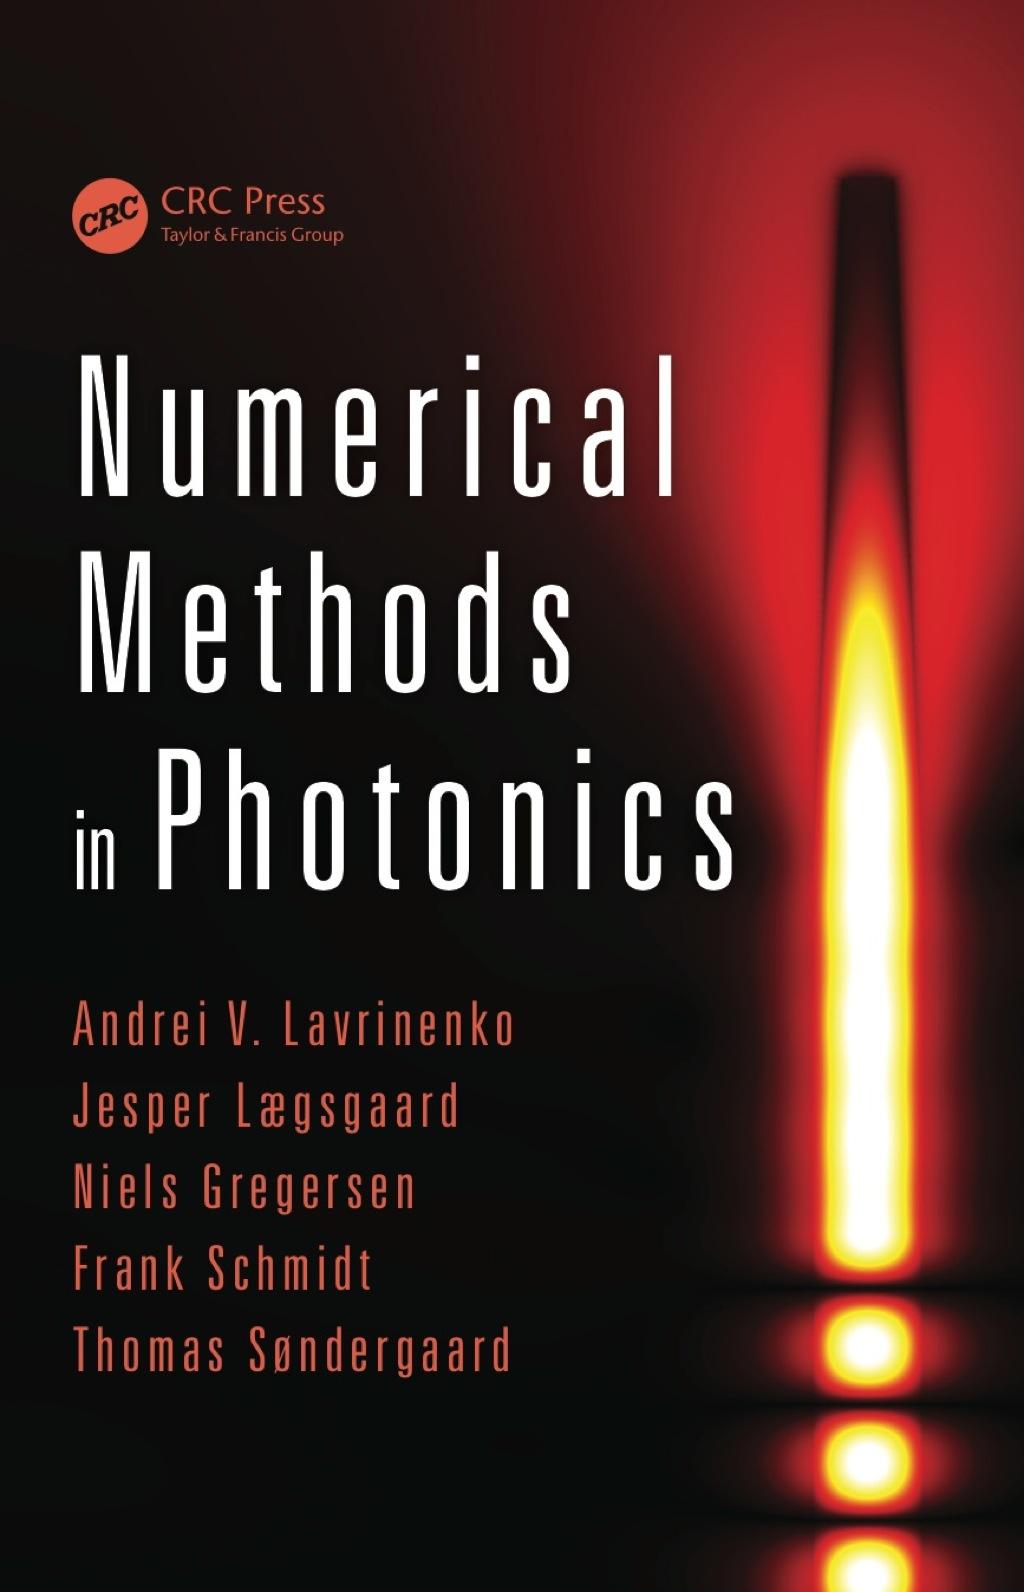 Numerical Methods in Photonics (eBook Rental)